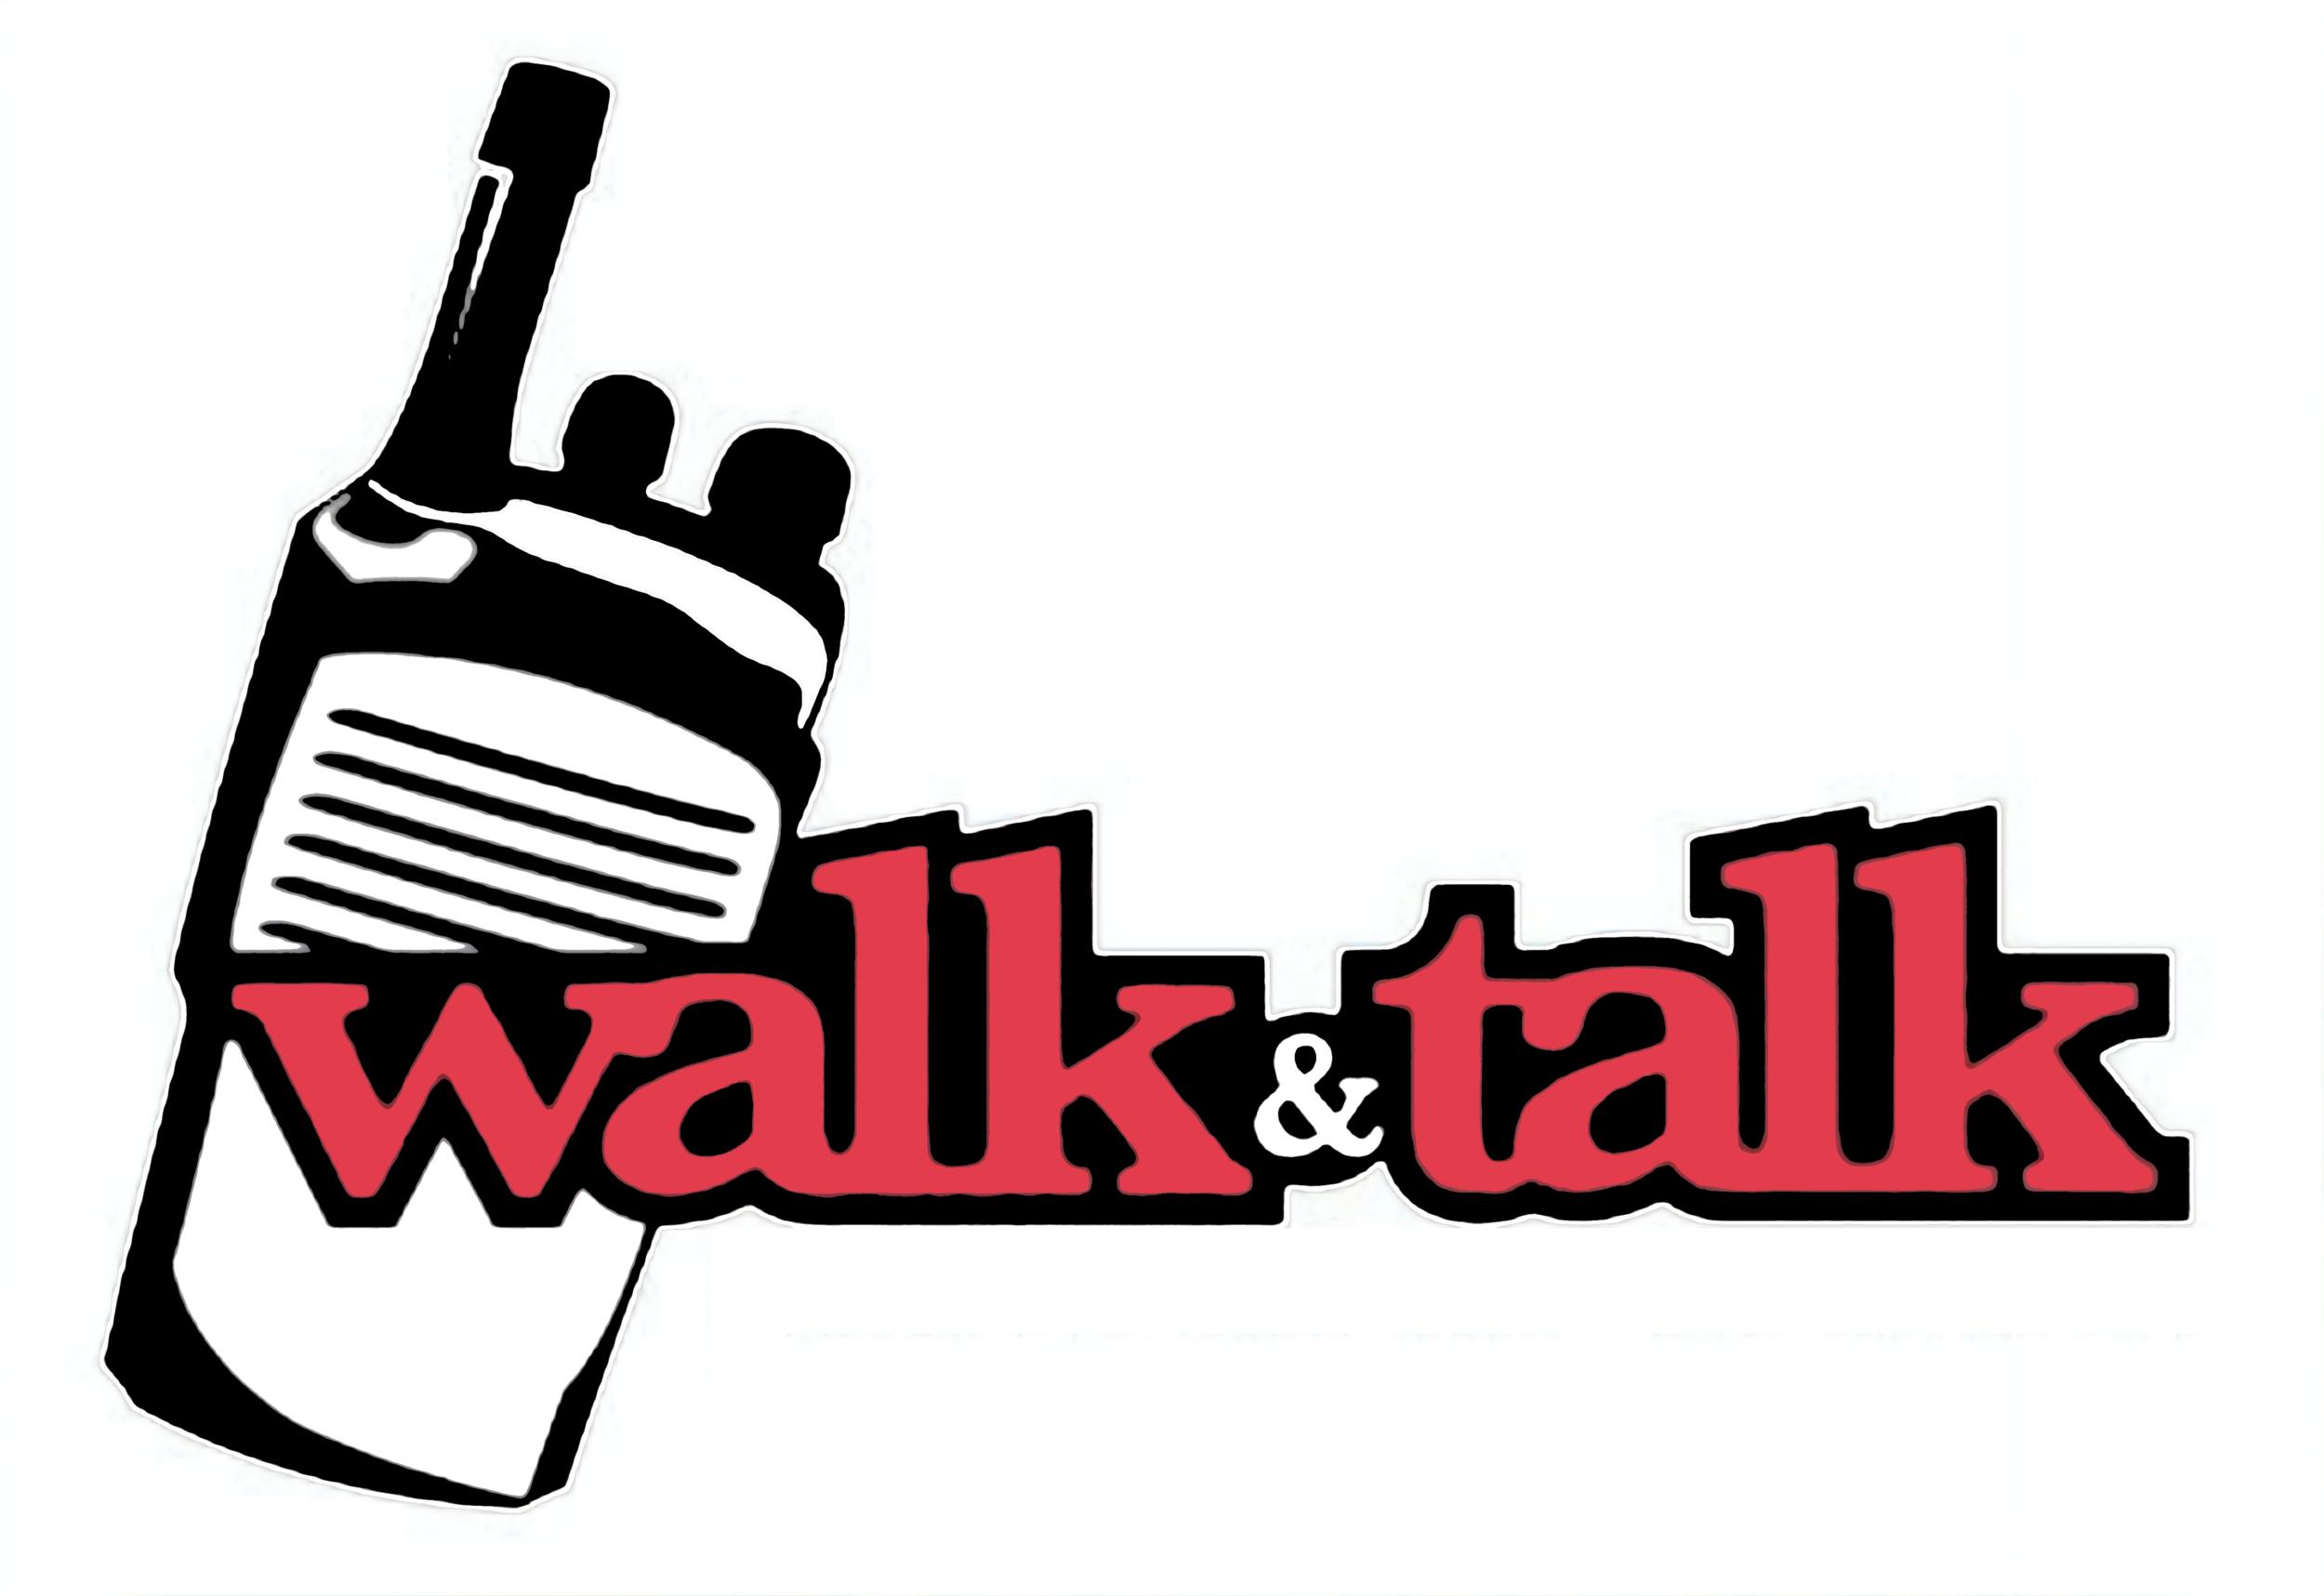 walk talk edit.png